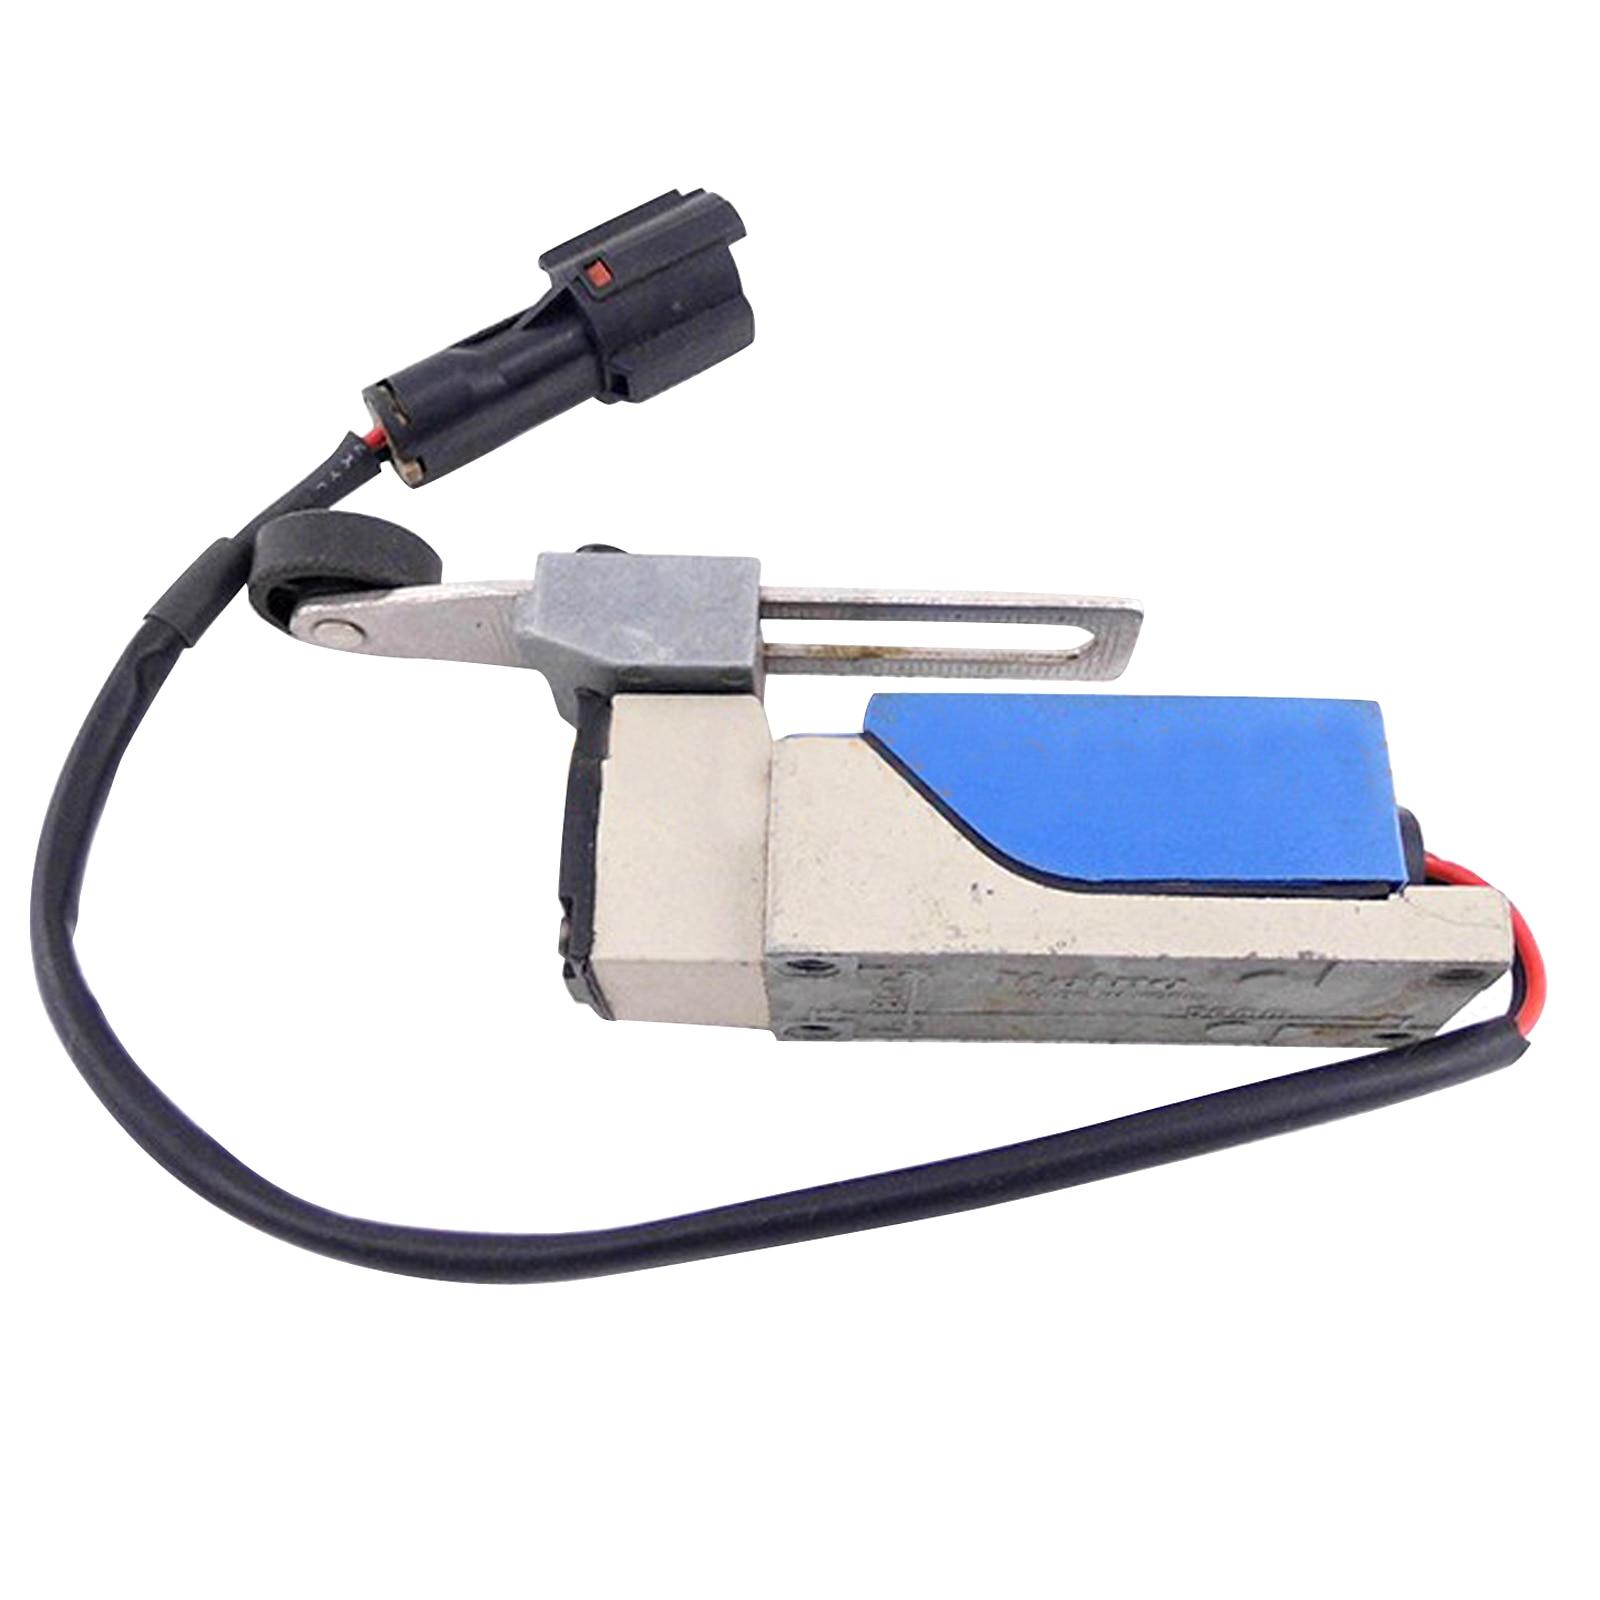 Magnetventil Magnet Schalter 301411-00030 30141100030 Passt Daewoo Doosan Bagger Teile